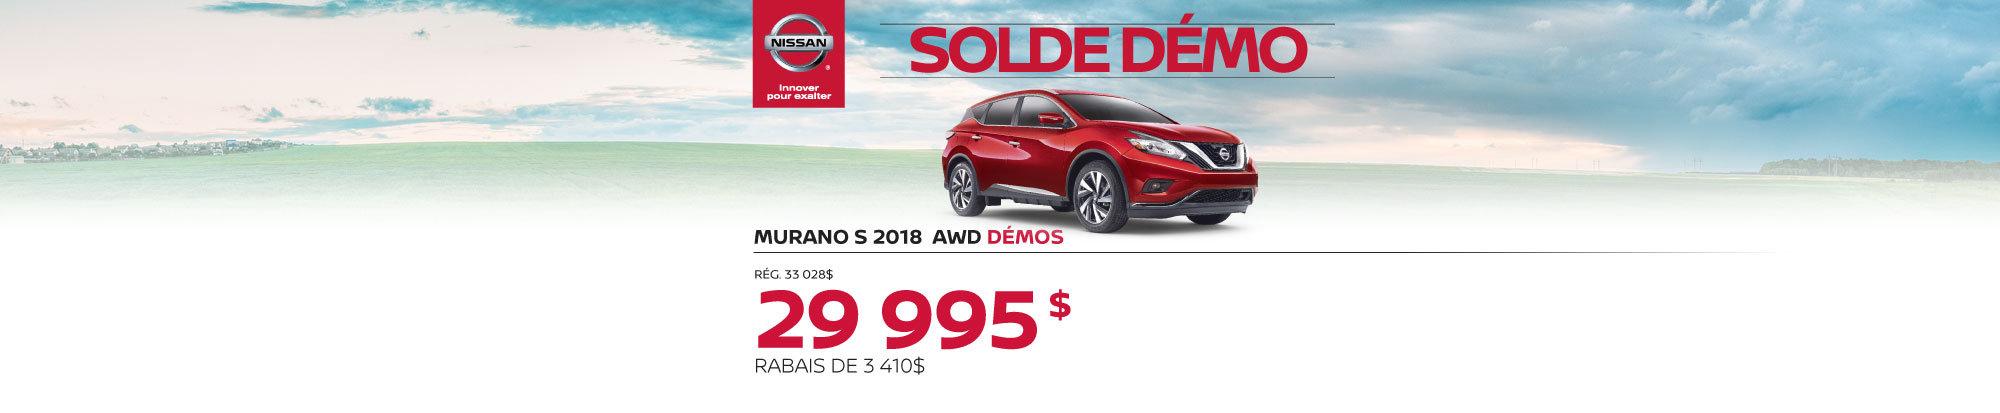 Nissan Murano Démo 2018 web